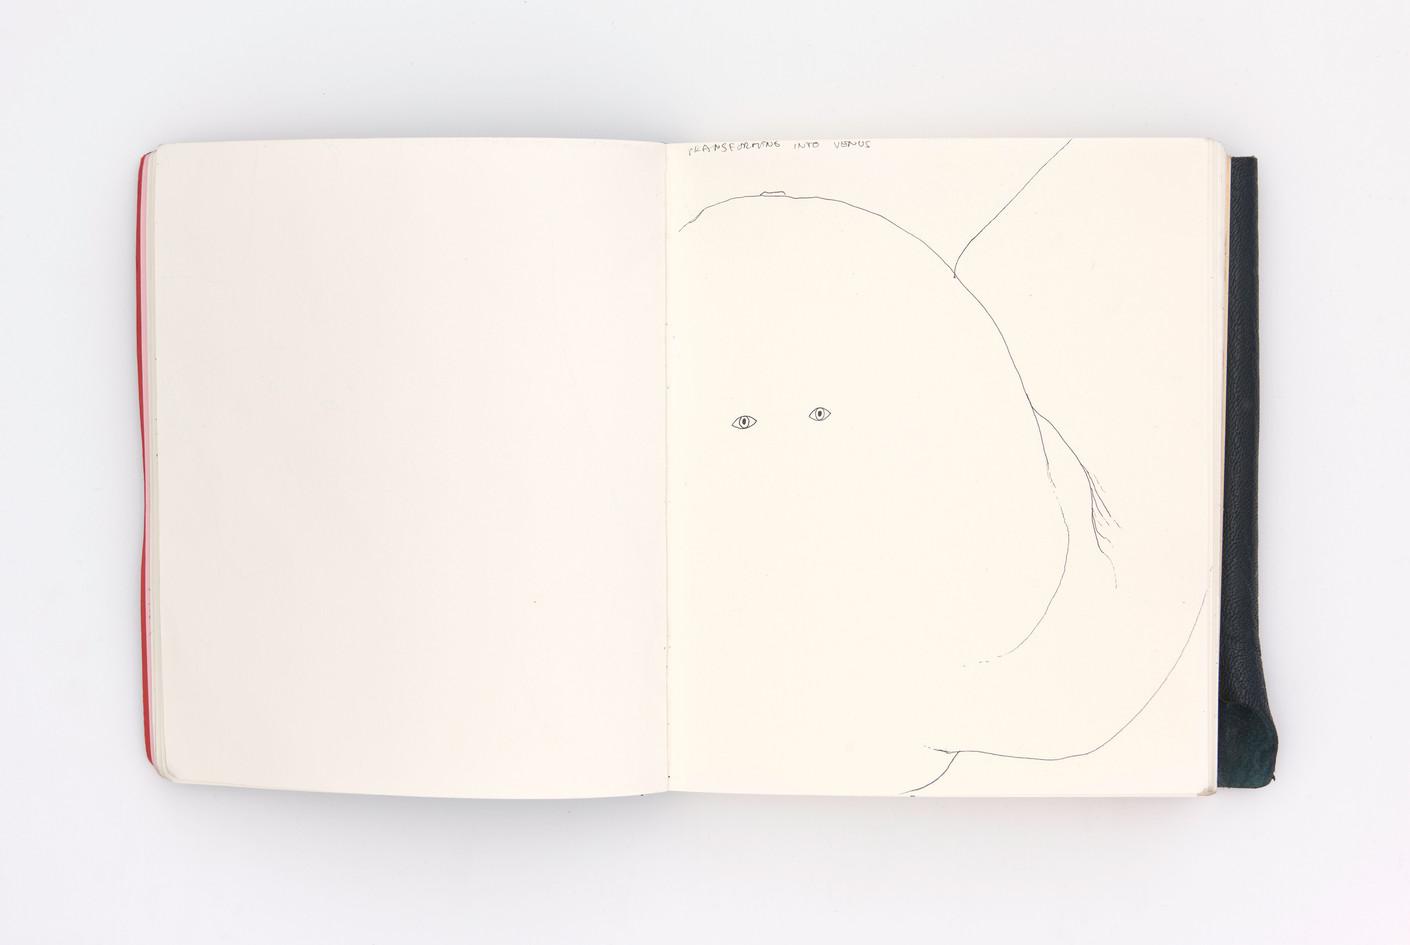 LargerBook-009.jpg